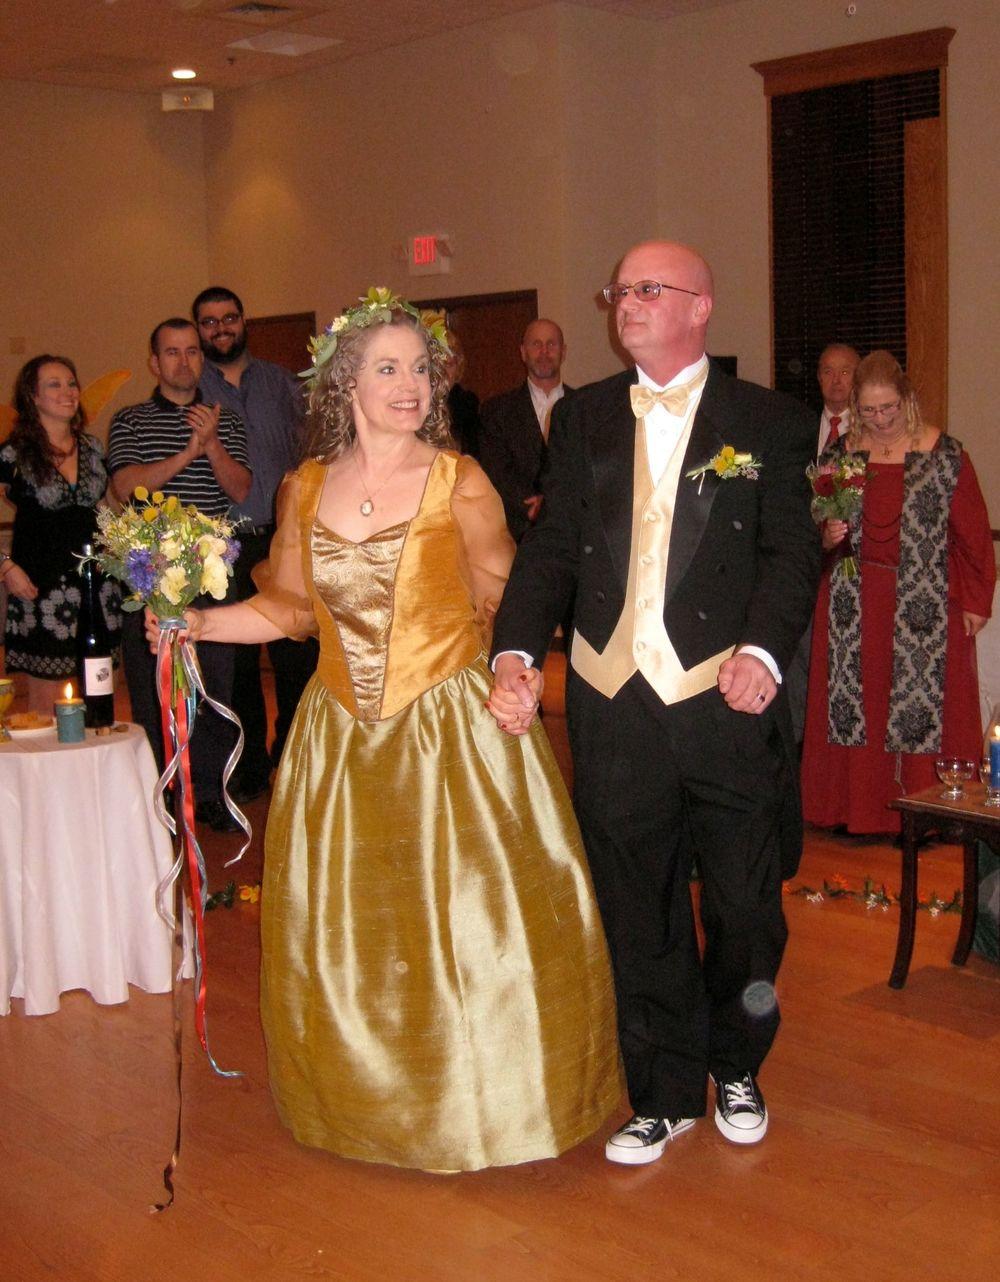 wed_dress_front2.jpg